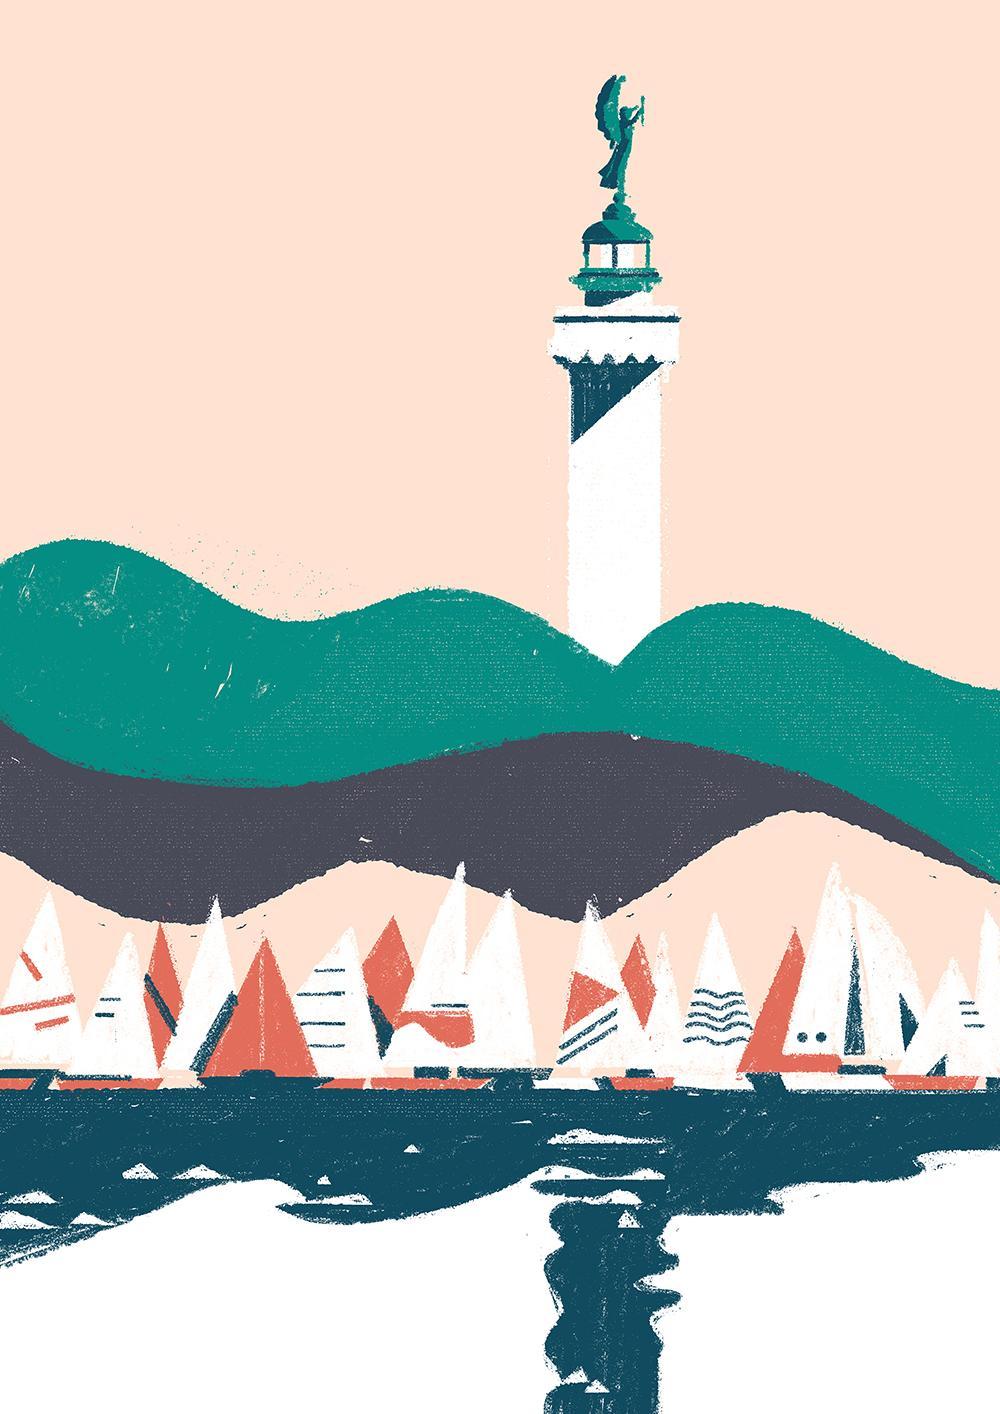 Timberland Let's get lost — Matteo Berton Portfolio